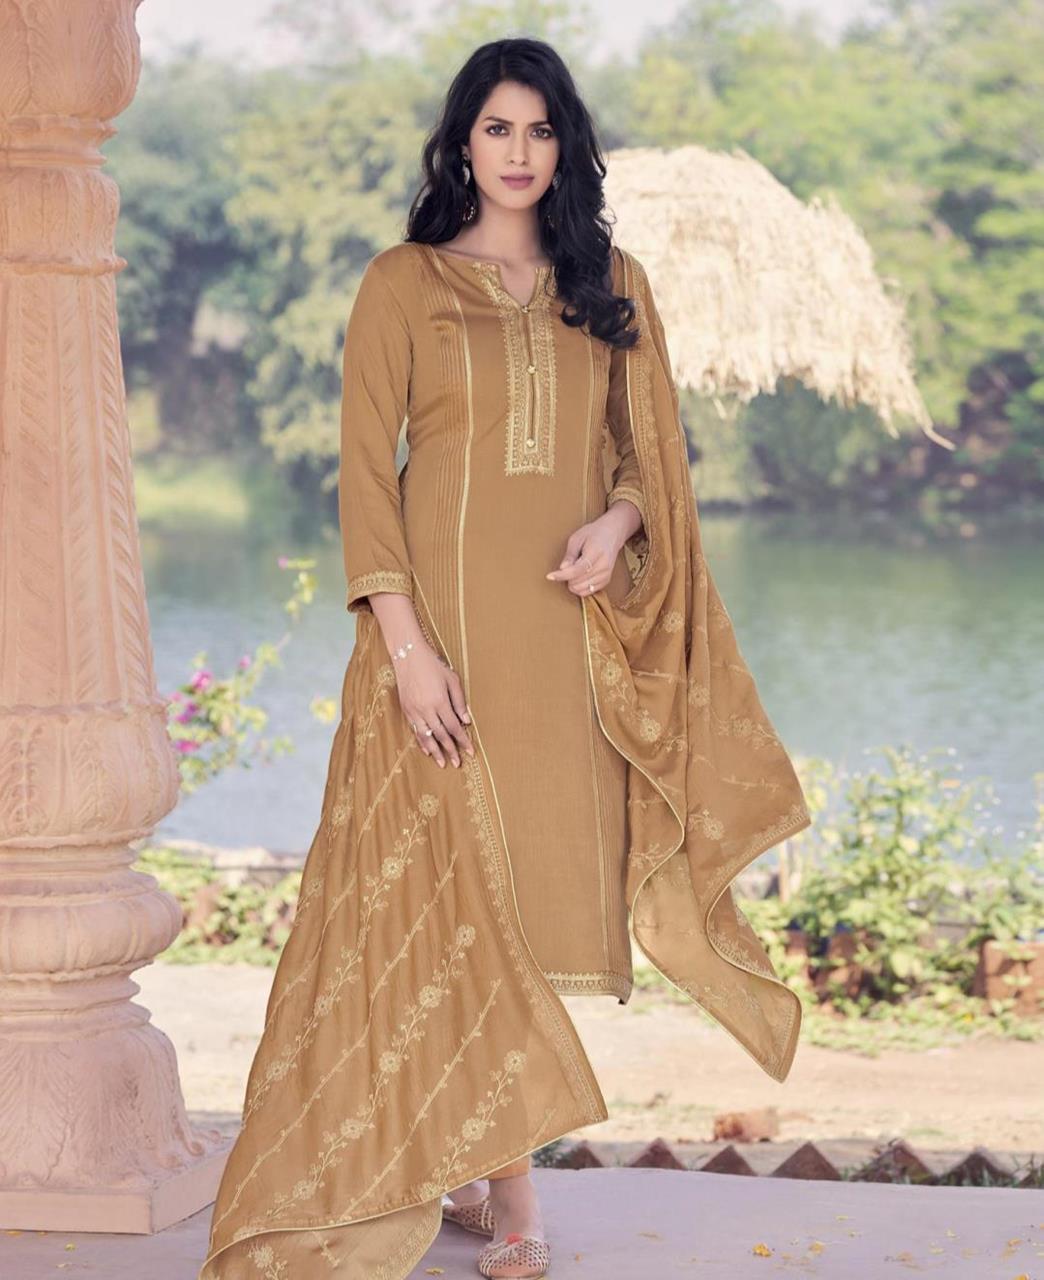 Zari Cotton Straight cut Salwar Kameez in Light Brown